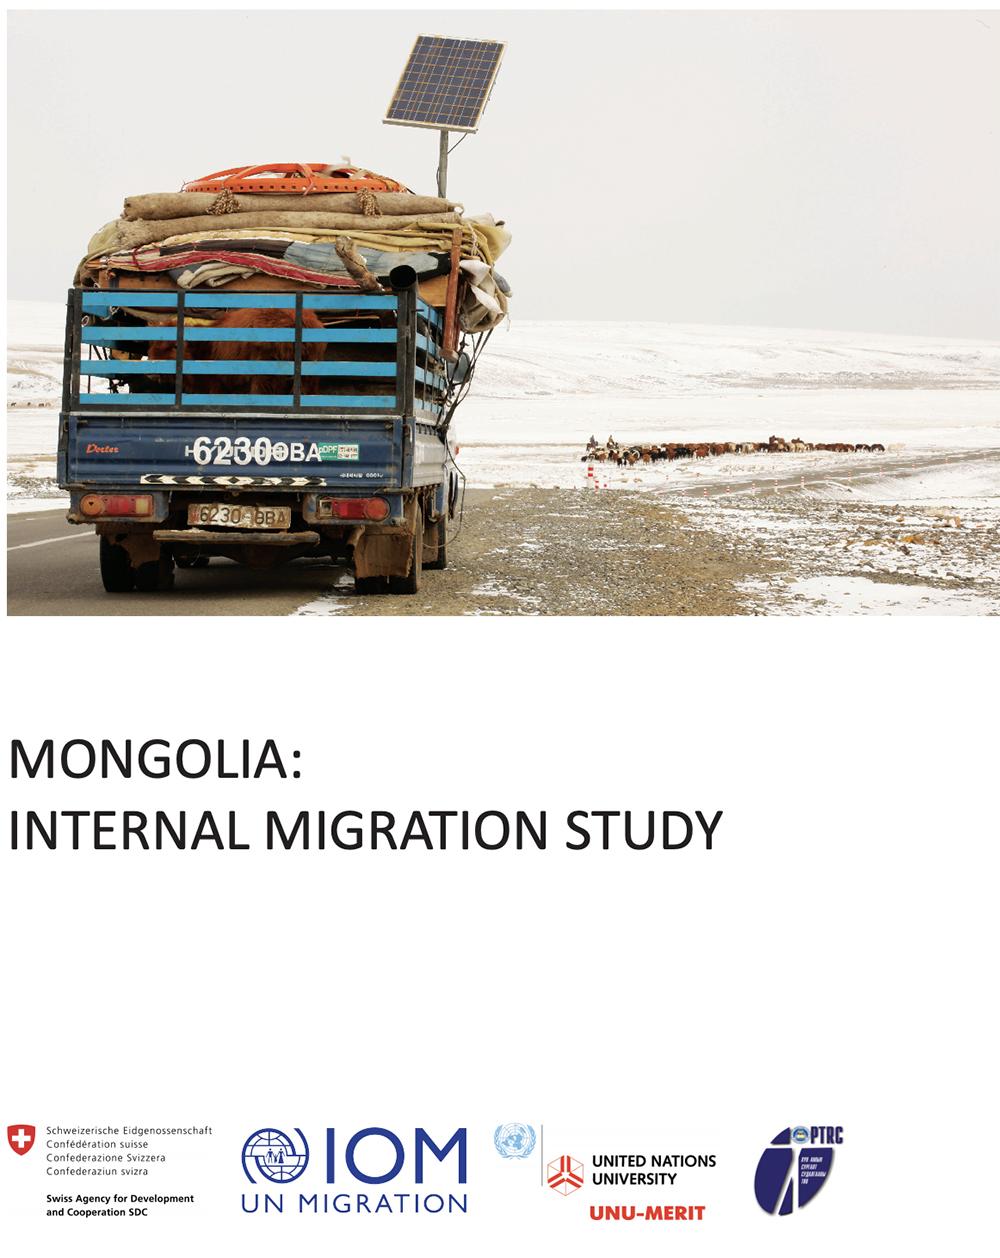 Mongolia Internal Migration Drives Urbanization, De-population of